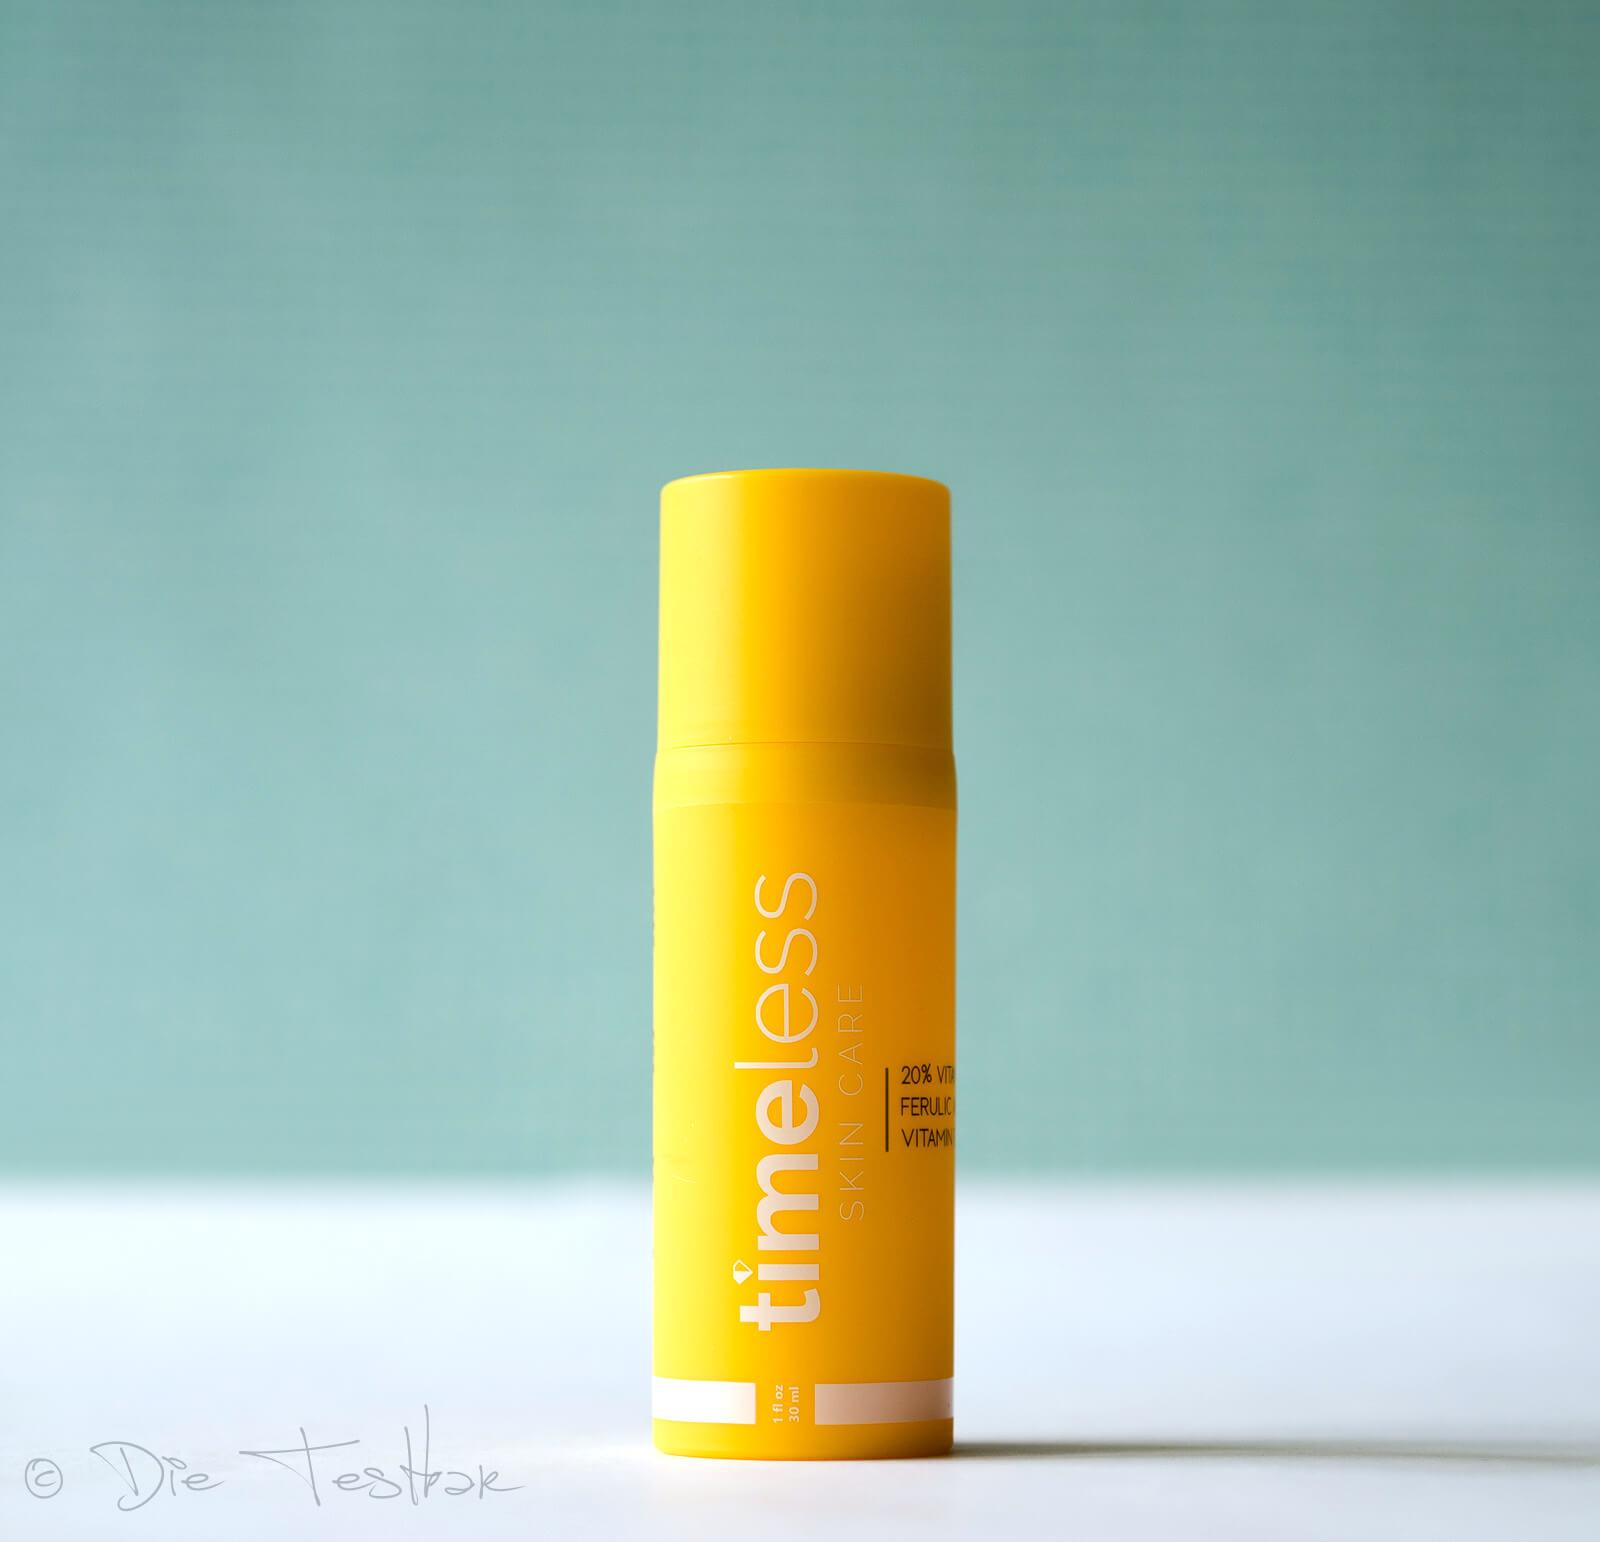 Timeless Skin Care - 20% Vitamin C + E Ferulic Acid Serum 30ml/1oz